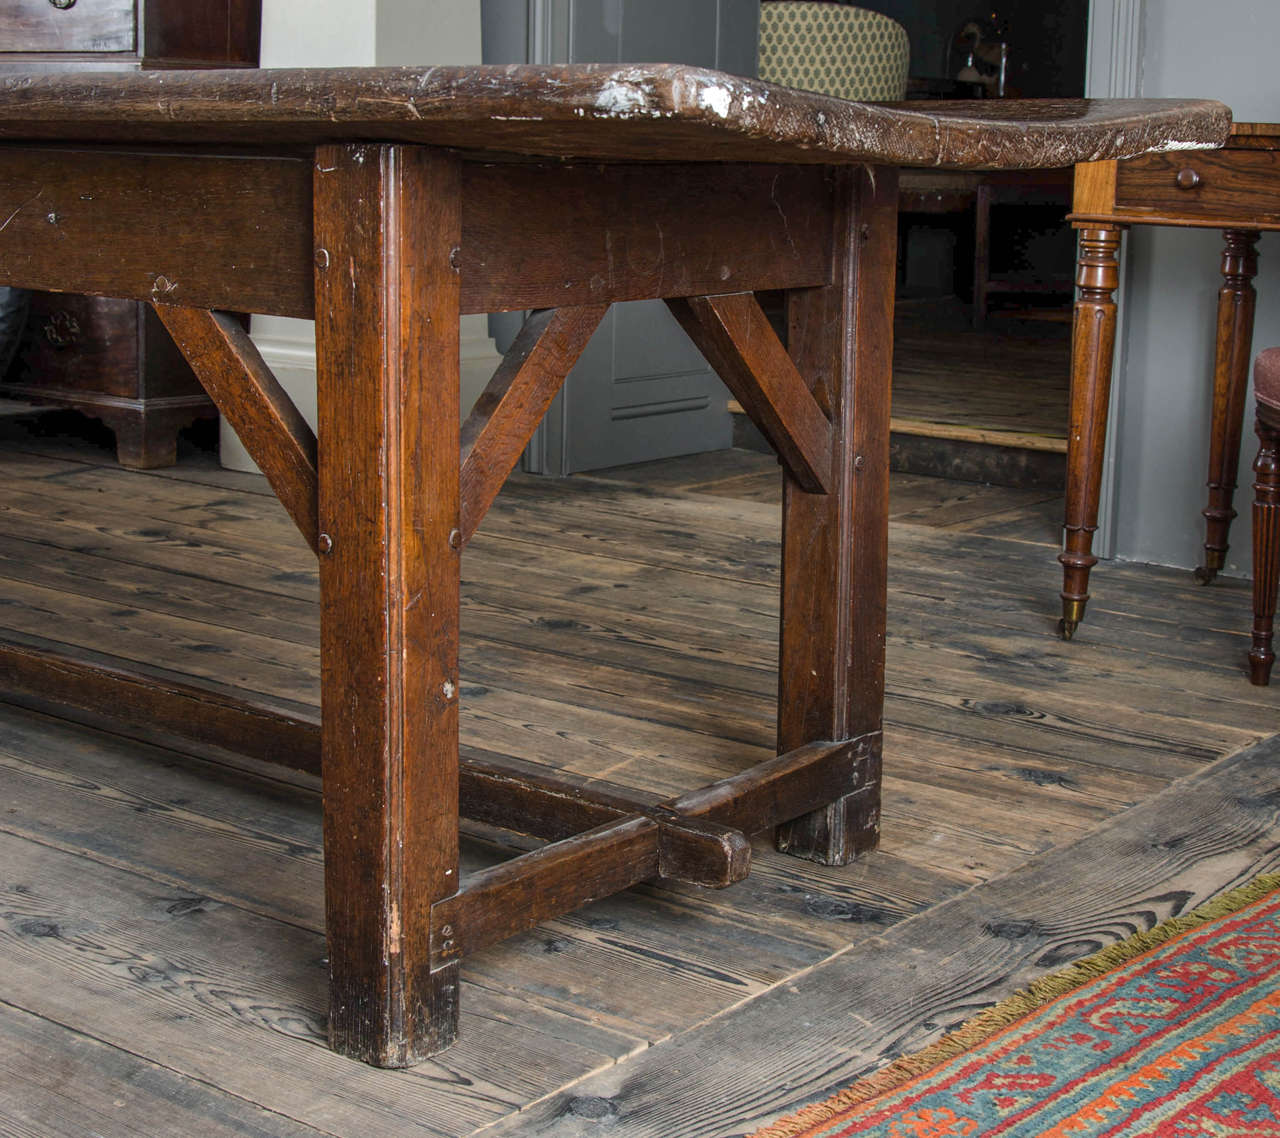 British 17th Century English Oak Refectory Table